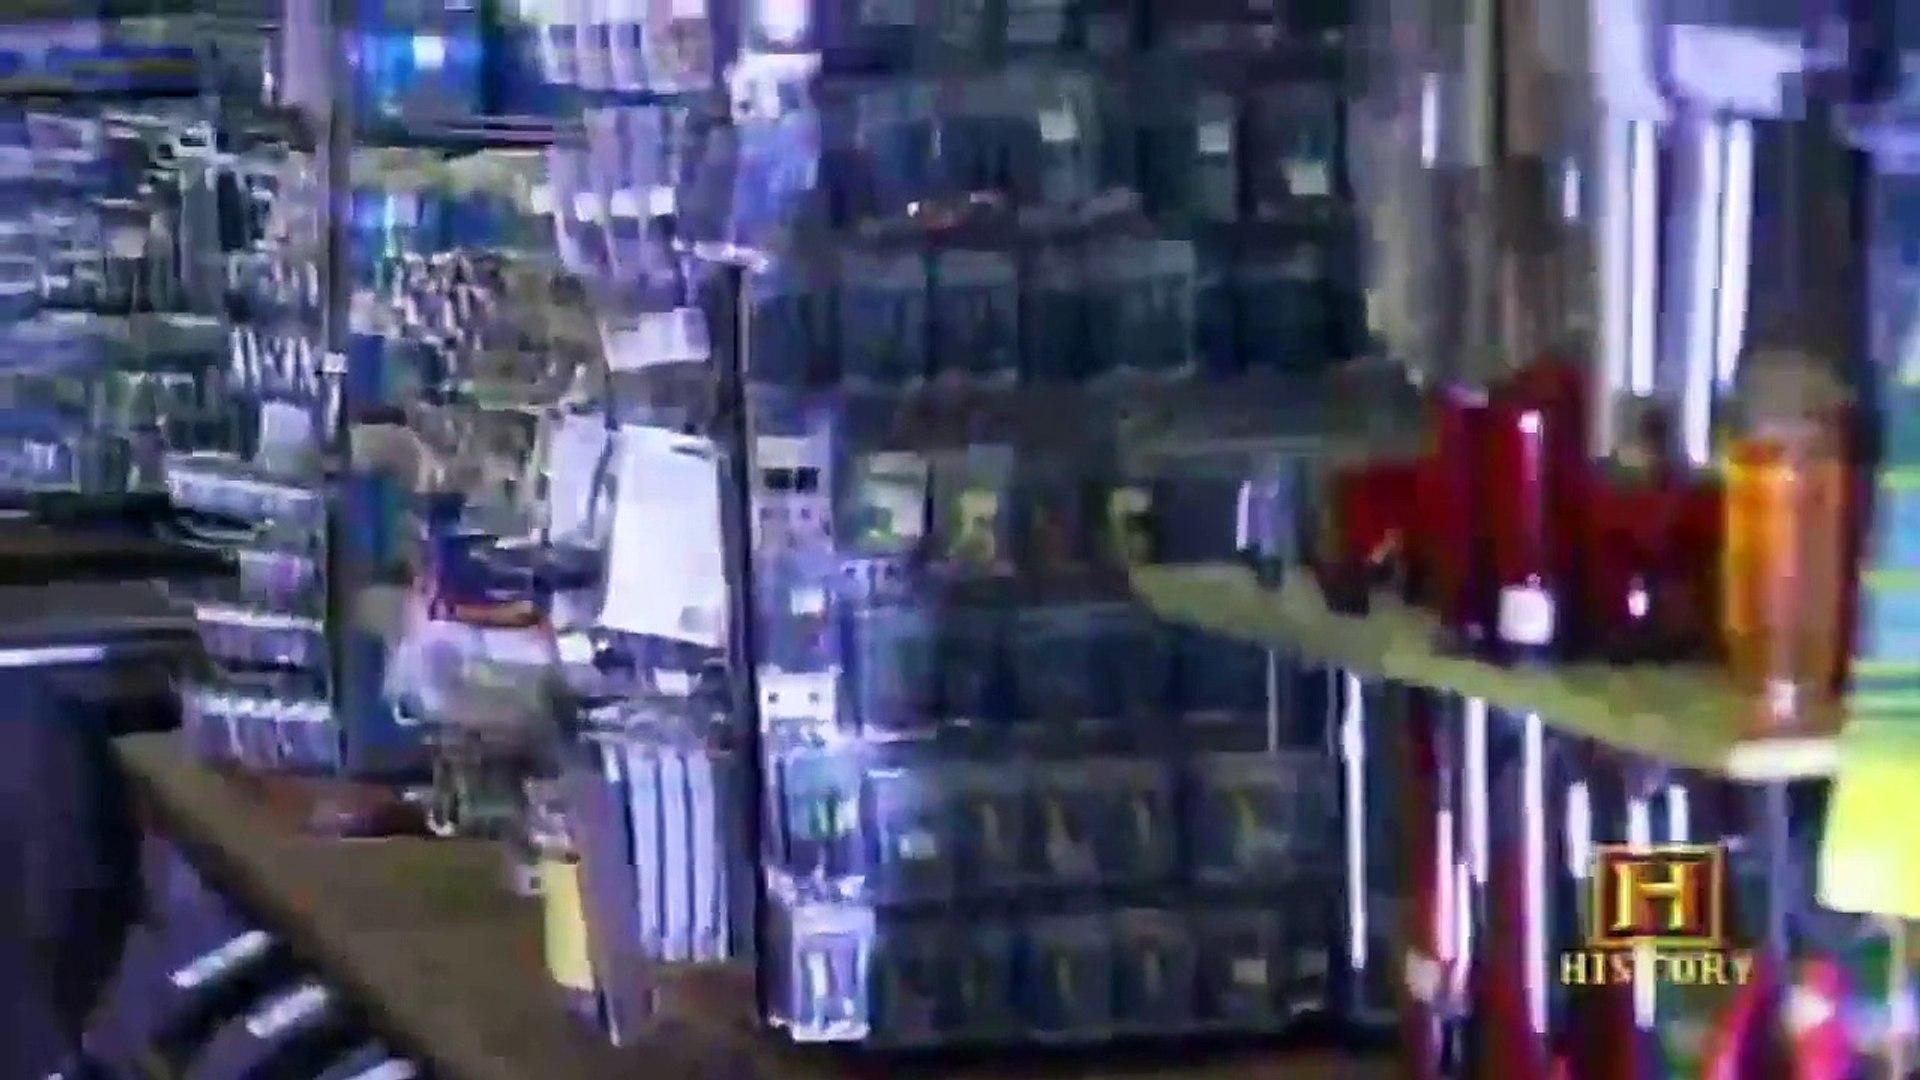 Supermarket Secrets - Inside The Hardware Store Documentary - Documentary Films (Official)